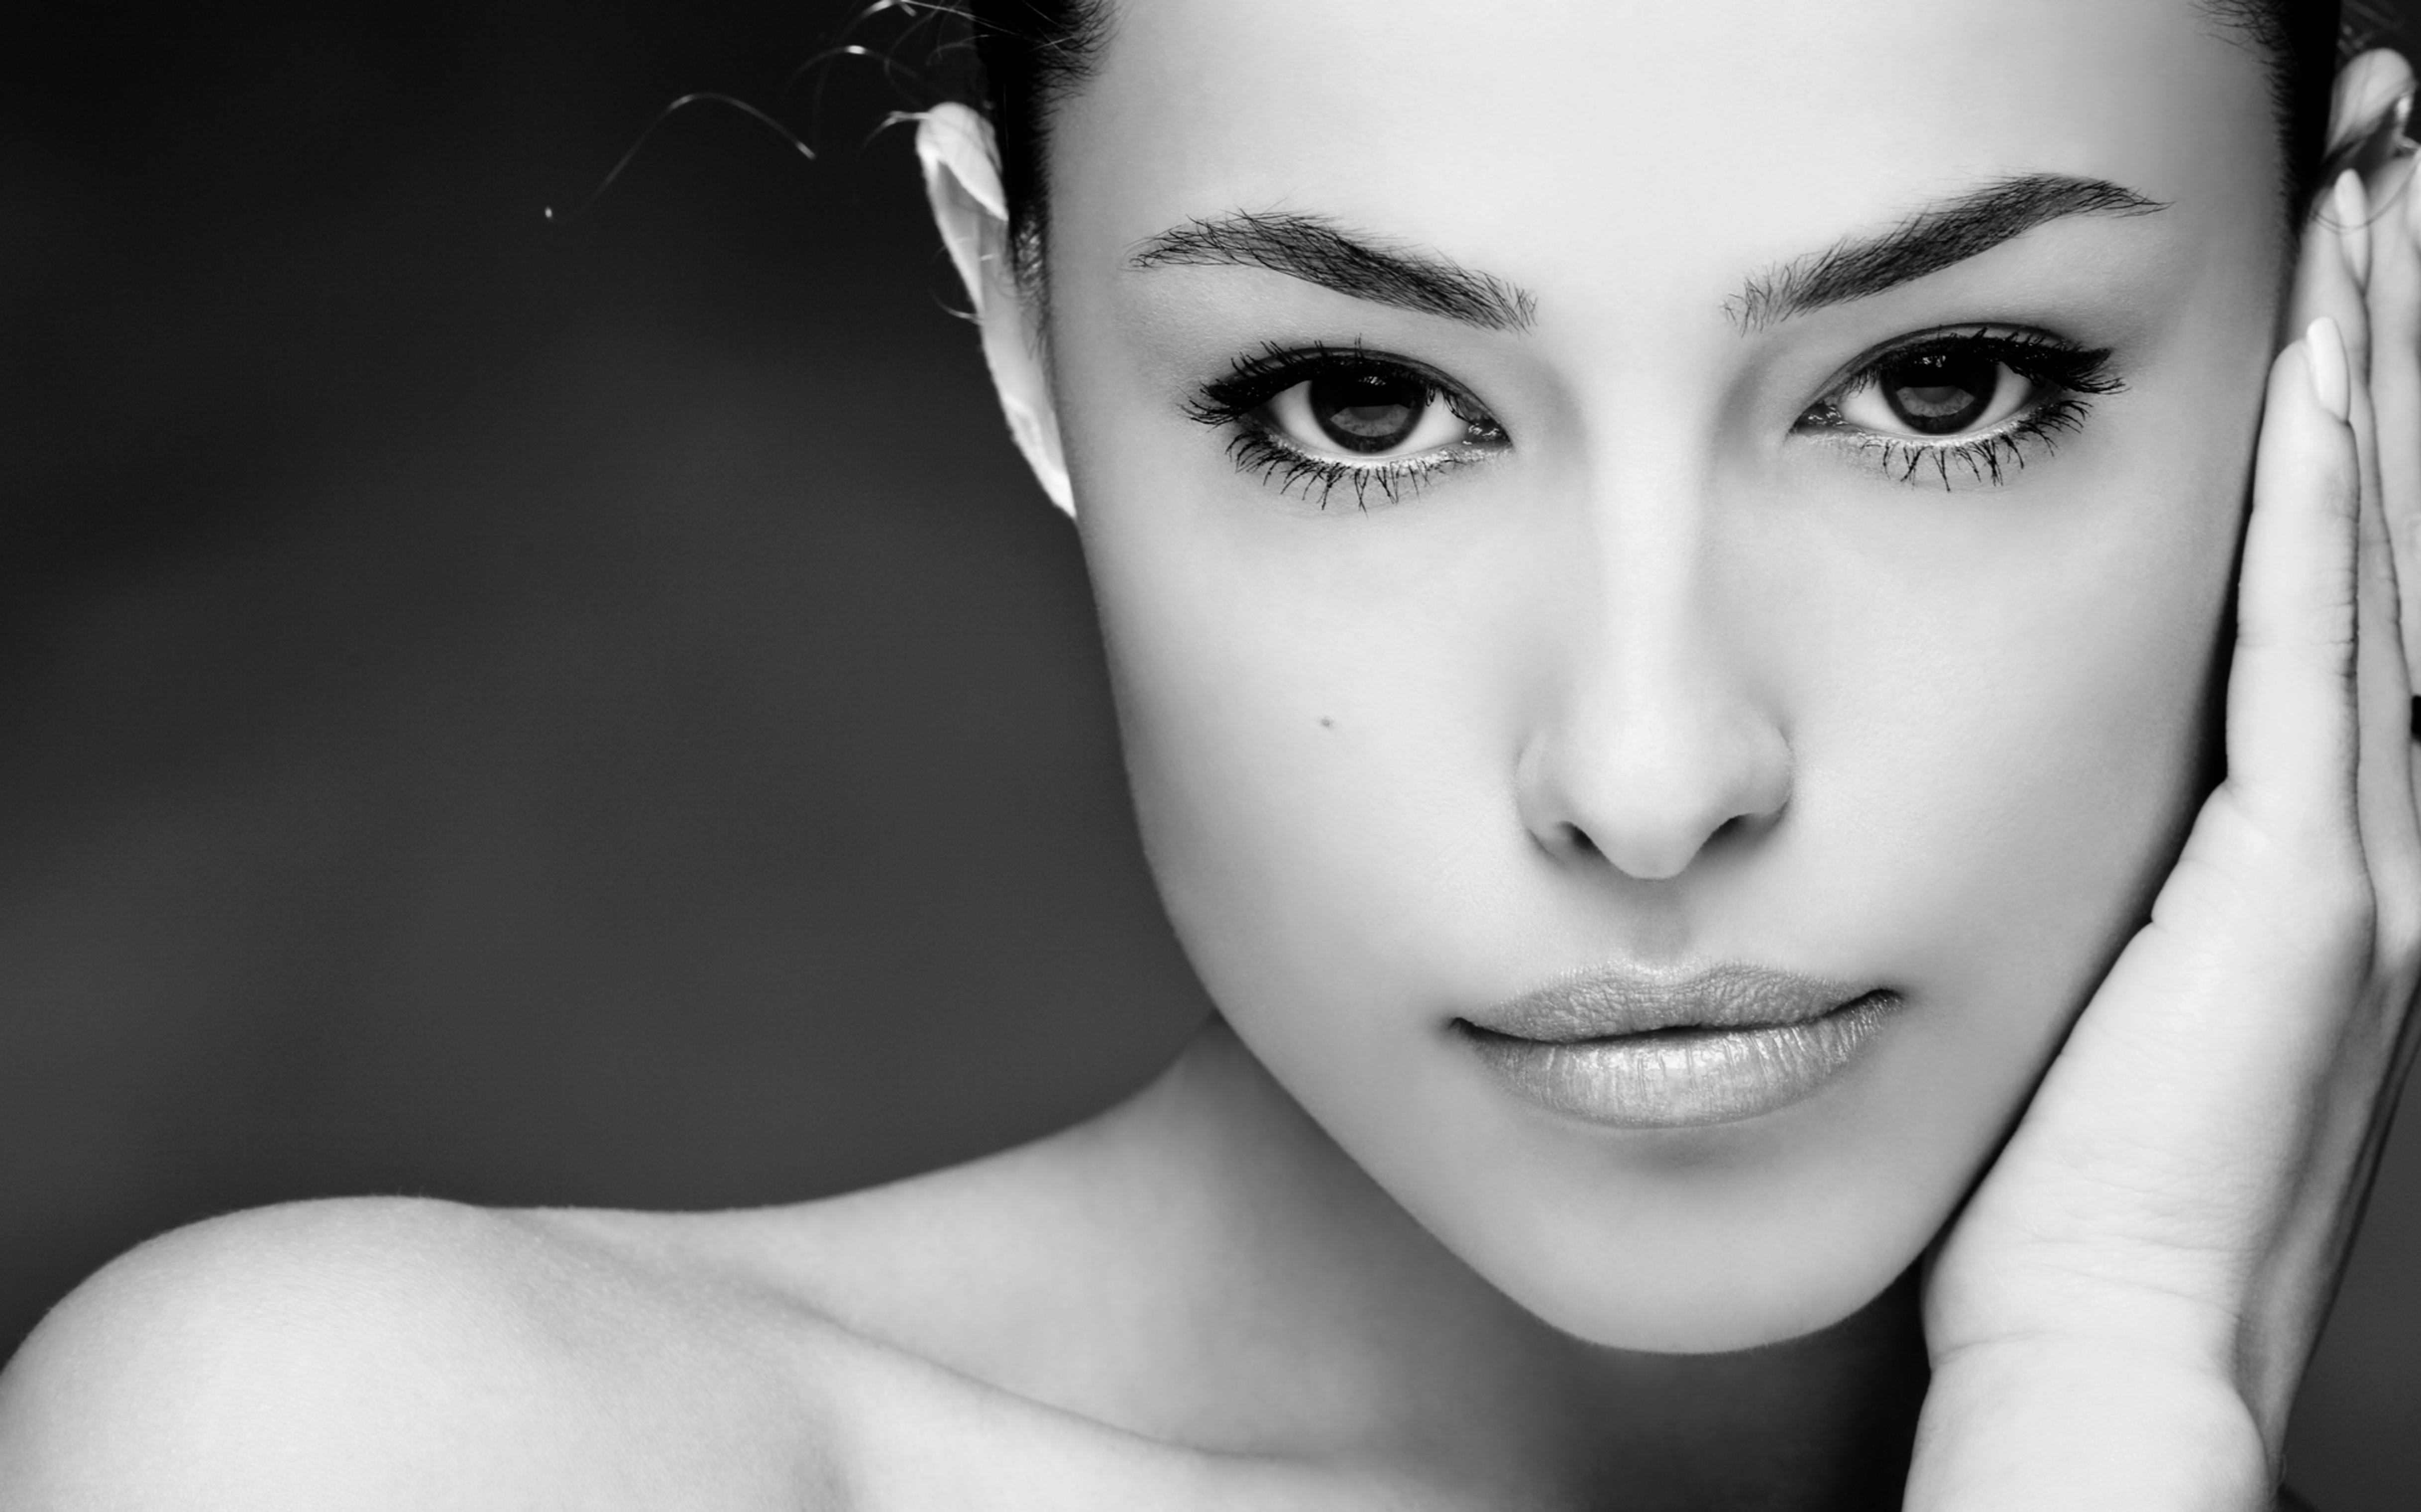 Skincare Consultation - 45 Mins